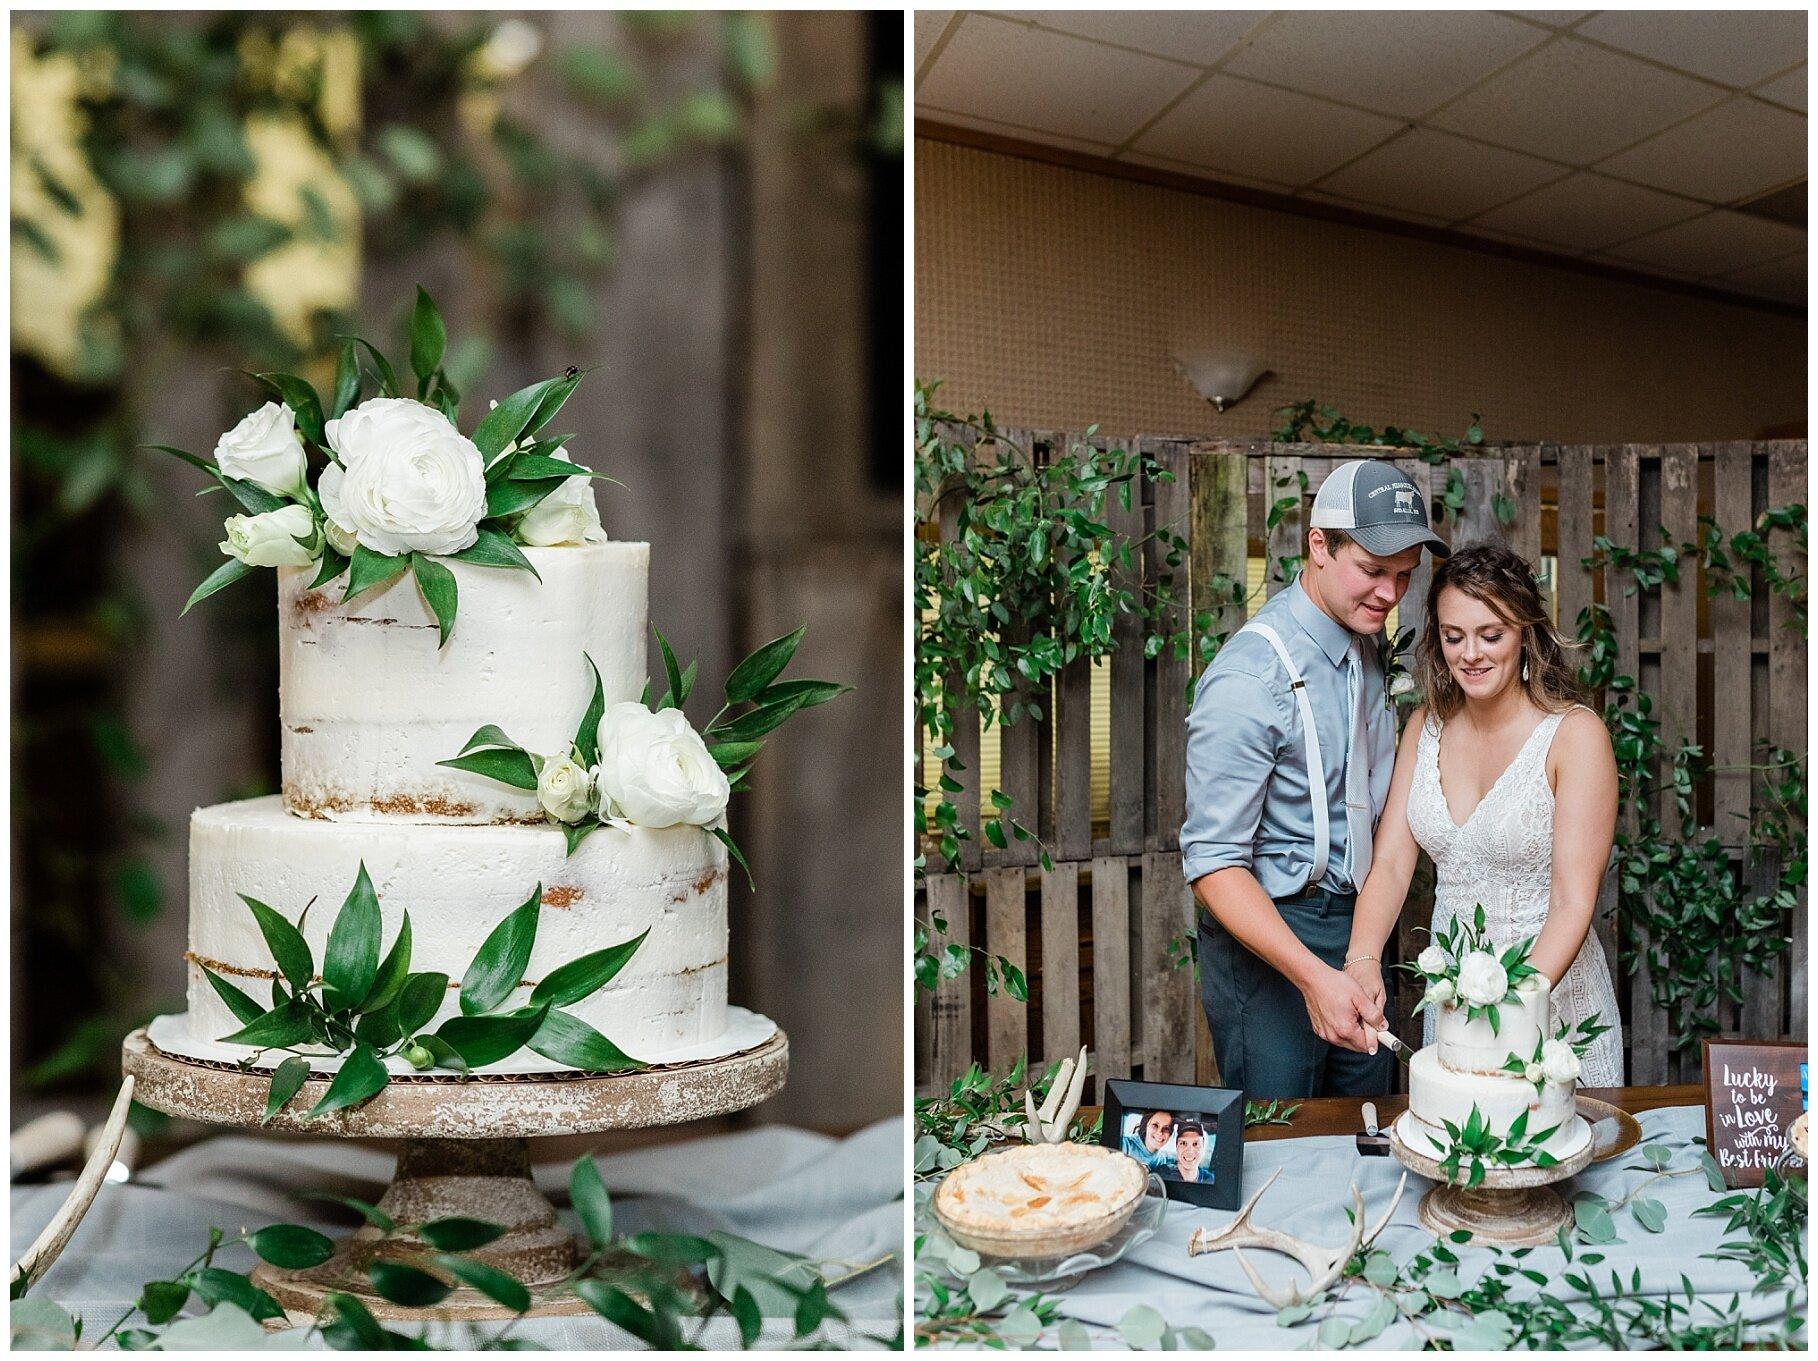 Earth-Toned Wedding by KKP Associate Wedding Photographer and Kelsi Kliethermes Photography Best Columbia Missouri Wedding Photographer_0029.jpg